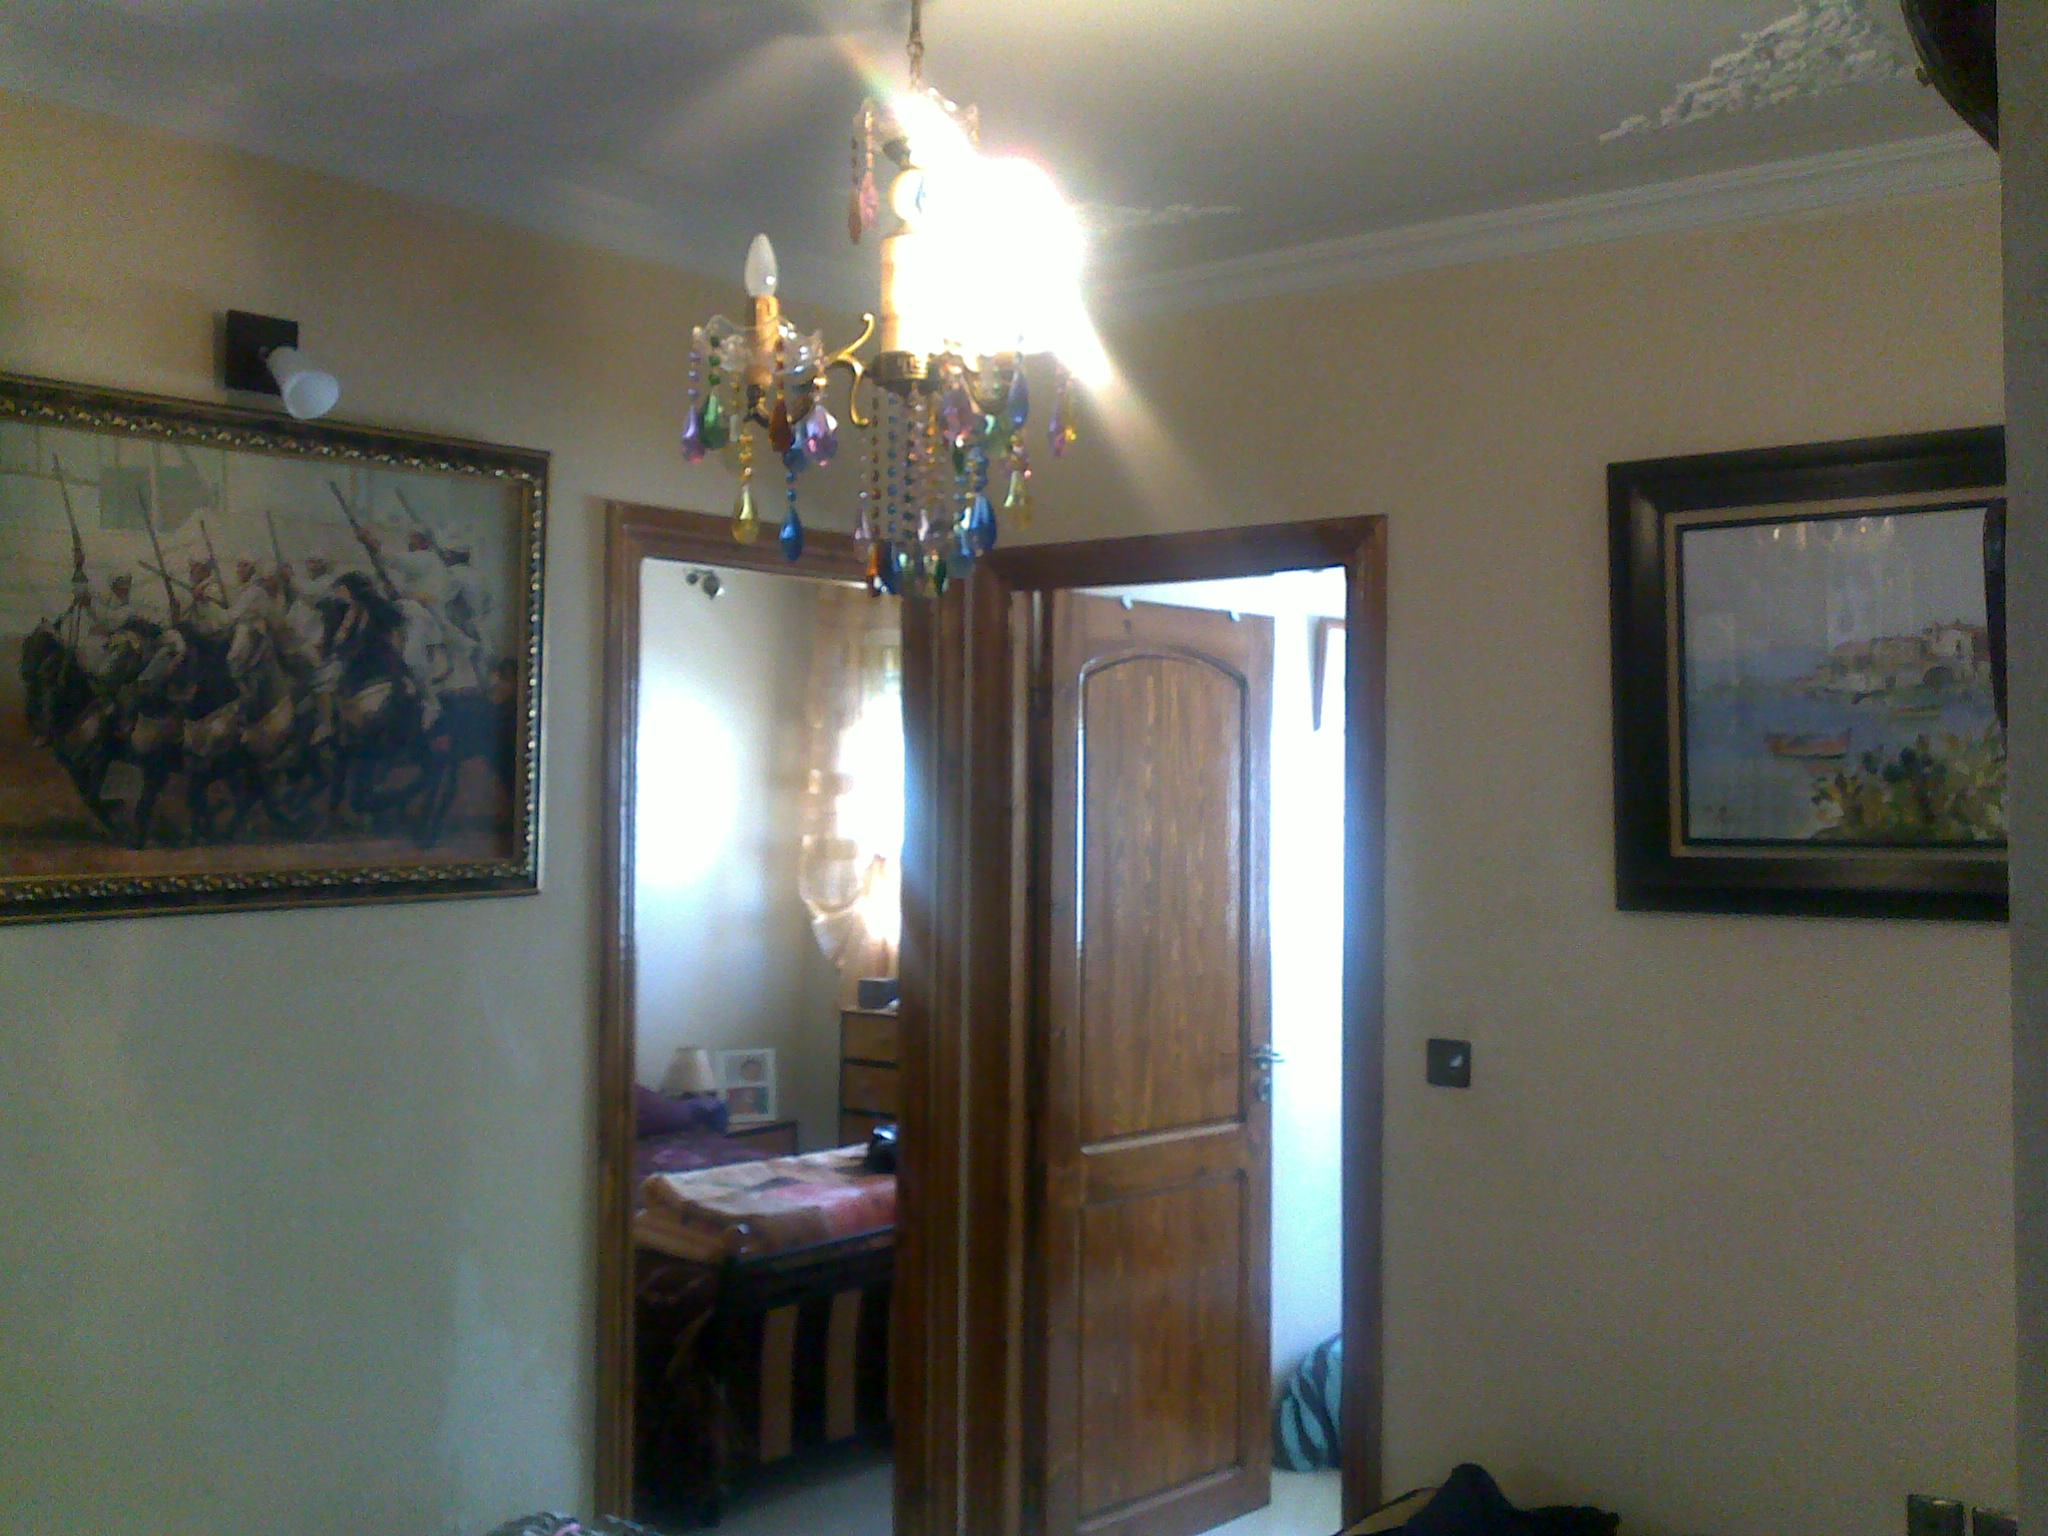 appartement louer eljadida maroc par jour location. Black Bedroom Furniture Sets. Home Design Ideas